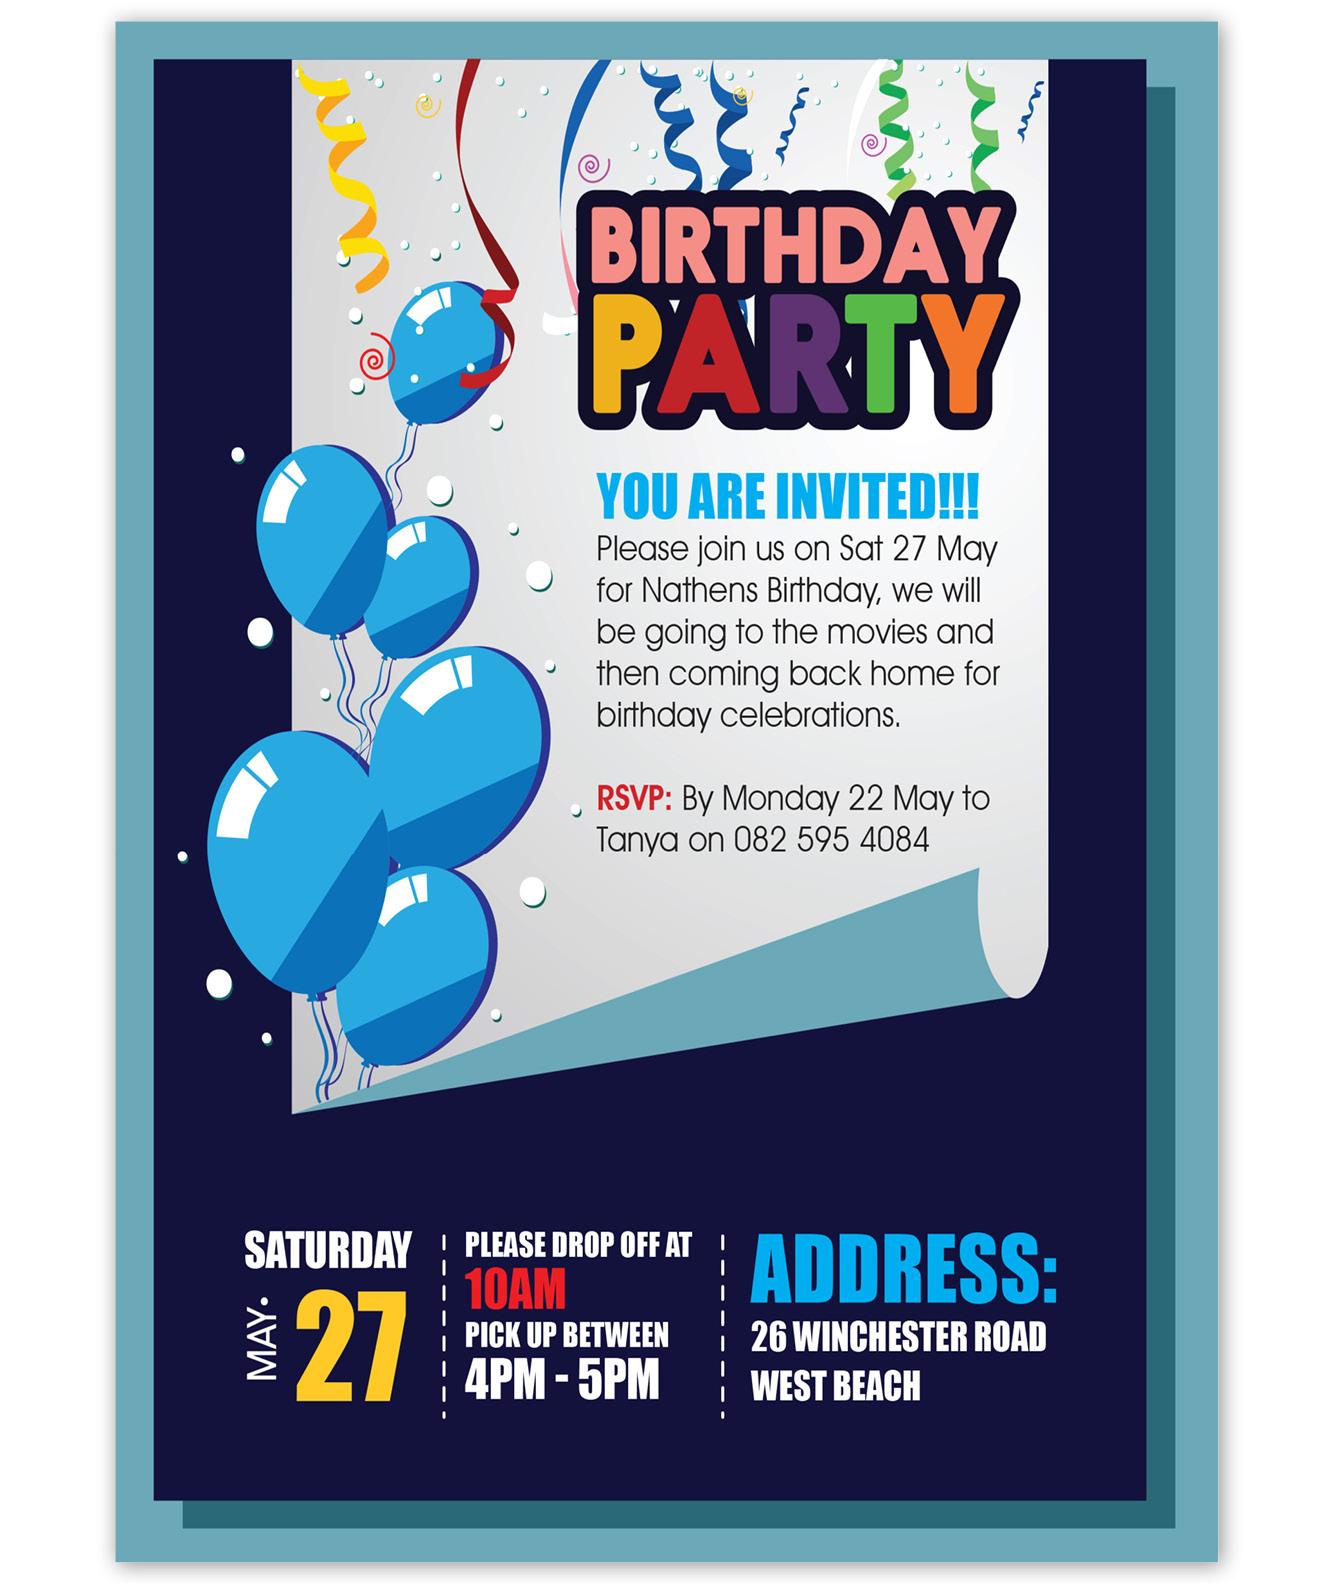 Birthday Party Invitation Design